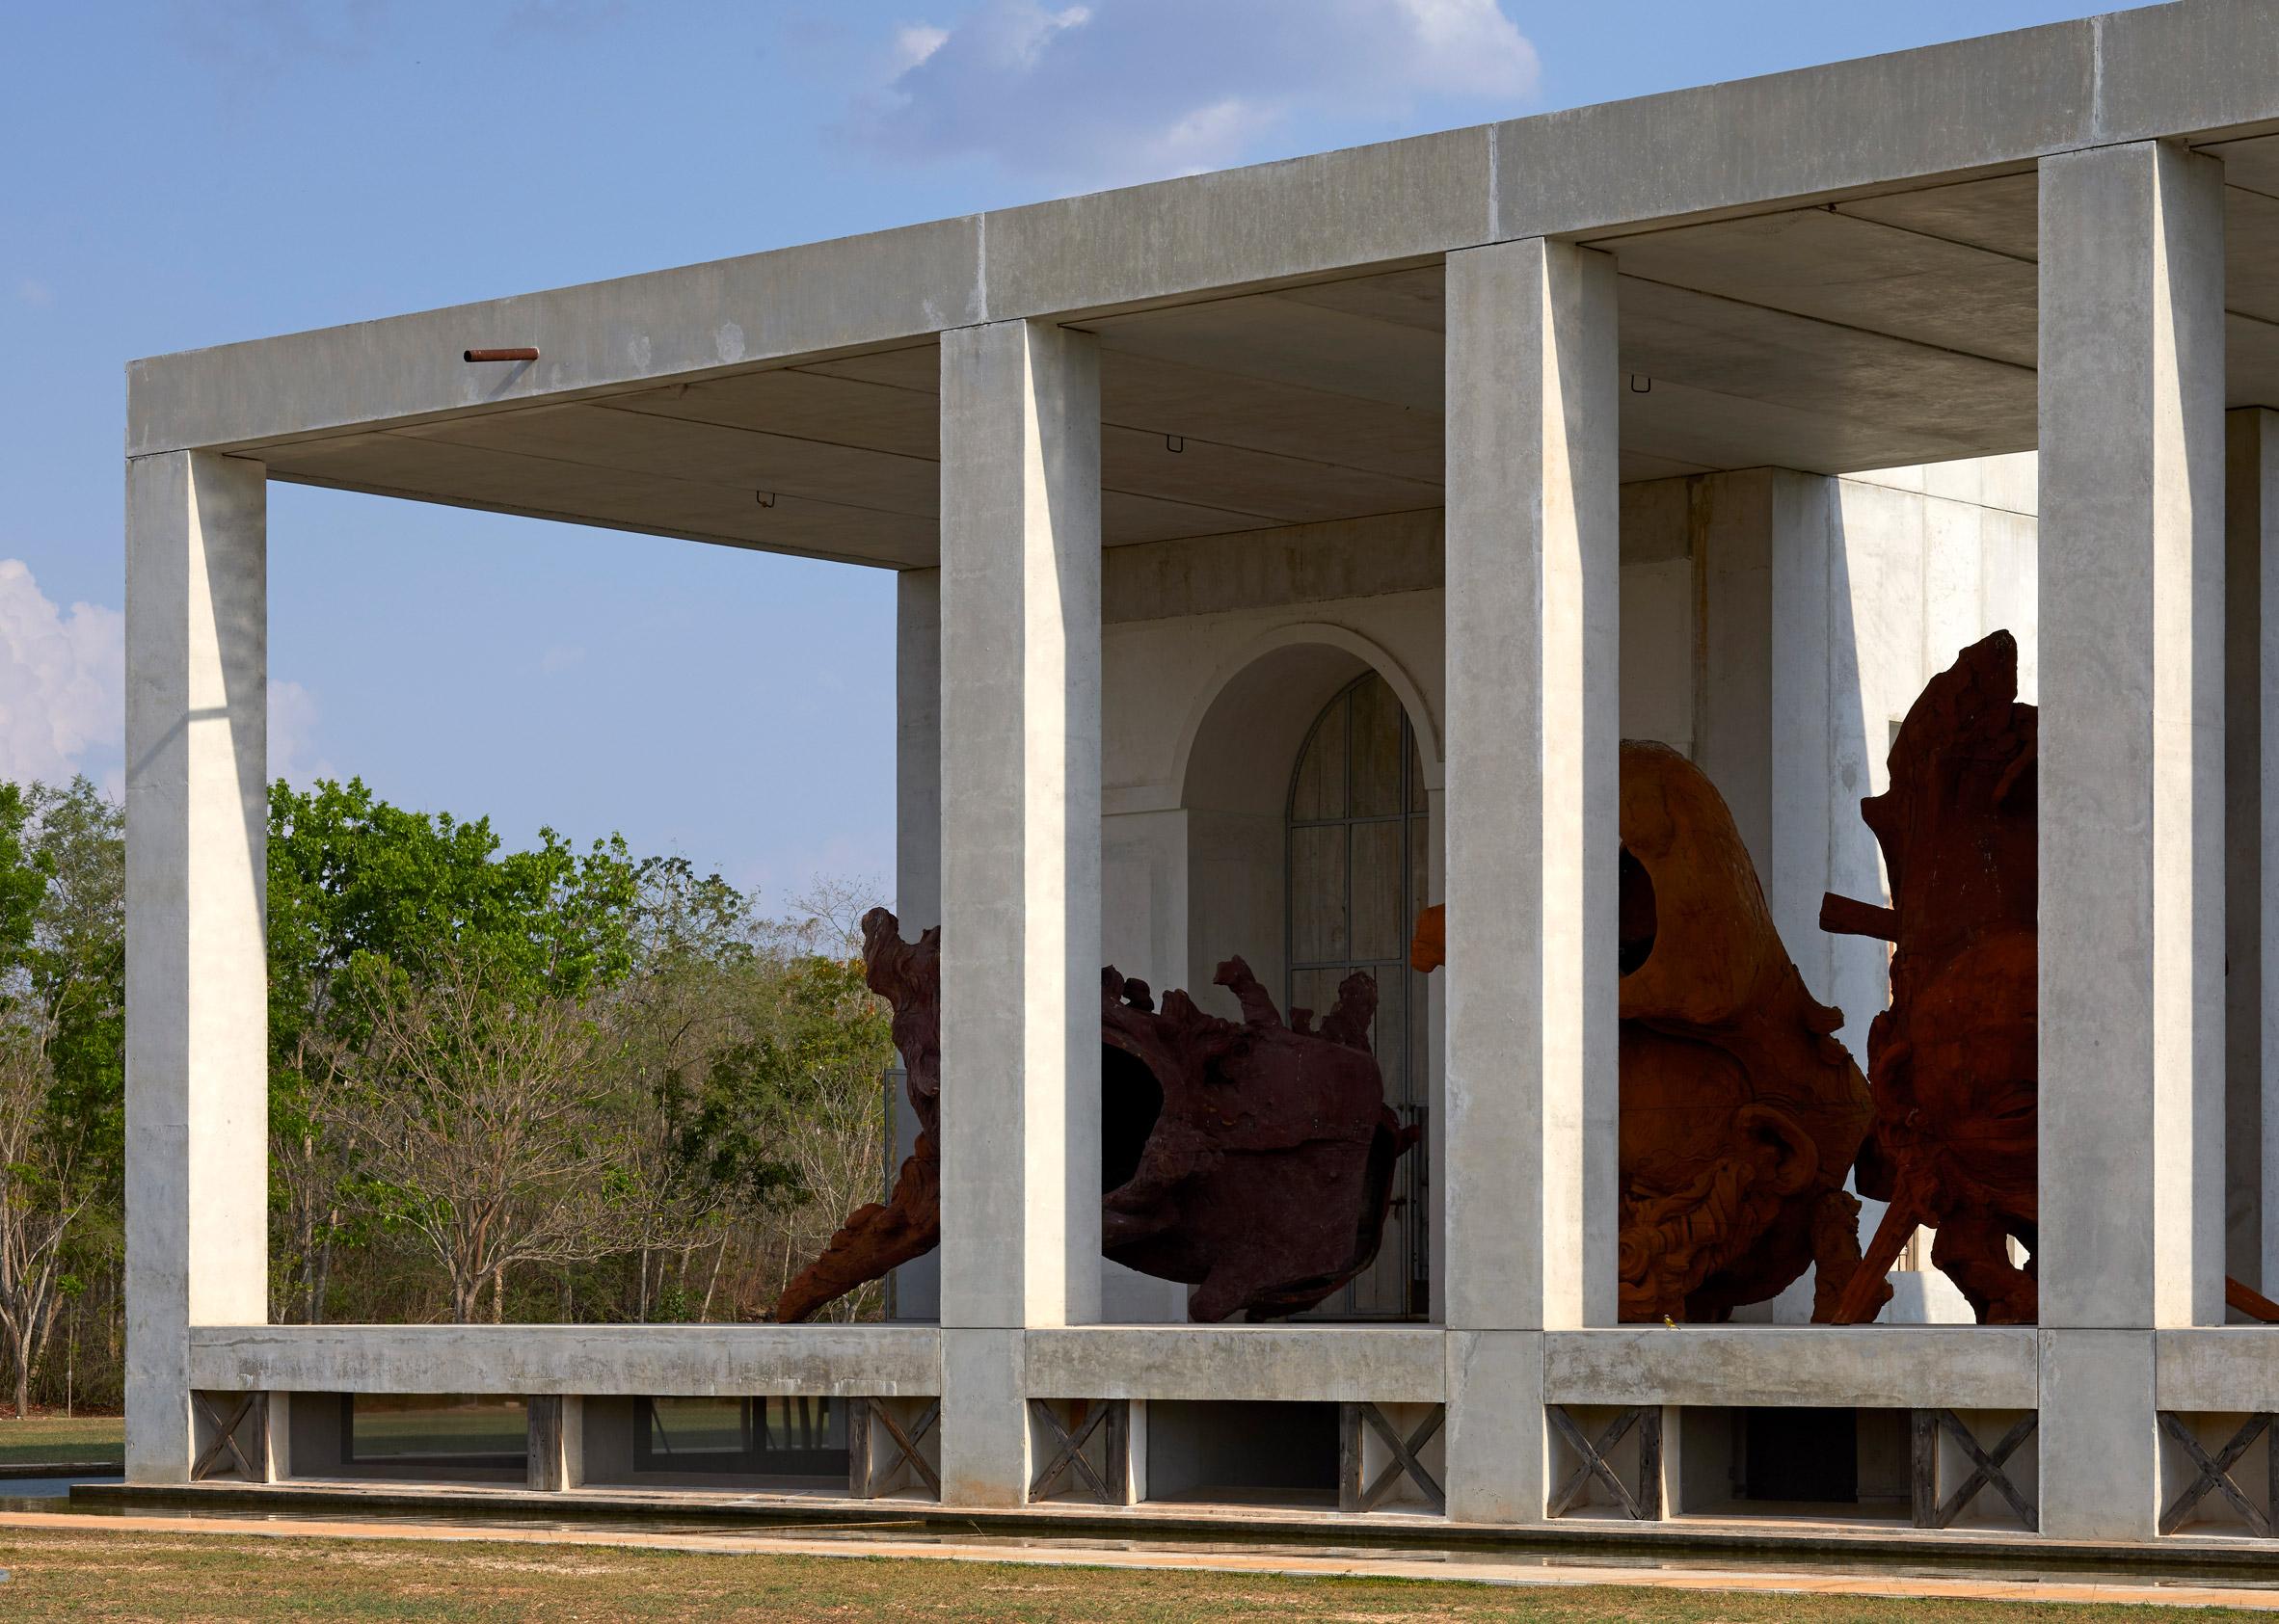 Plantel Matilde by Javier Marín and Arcadio Marín